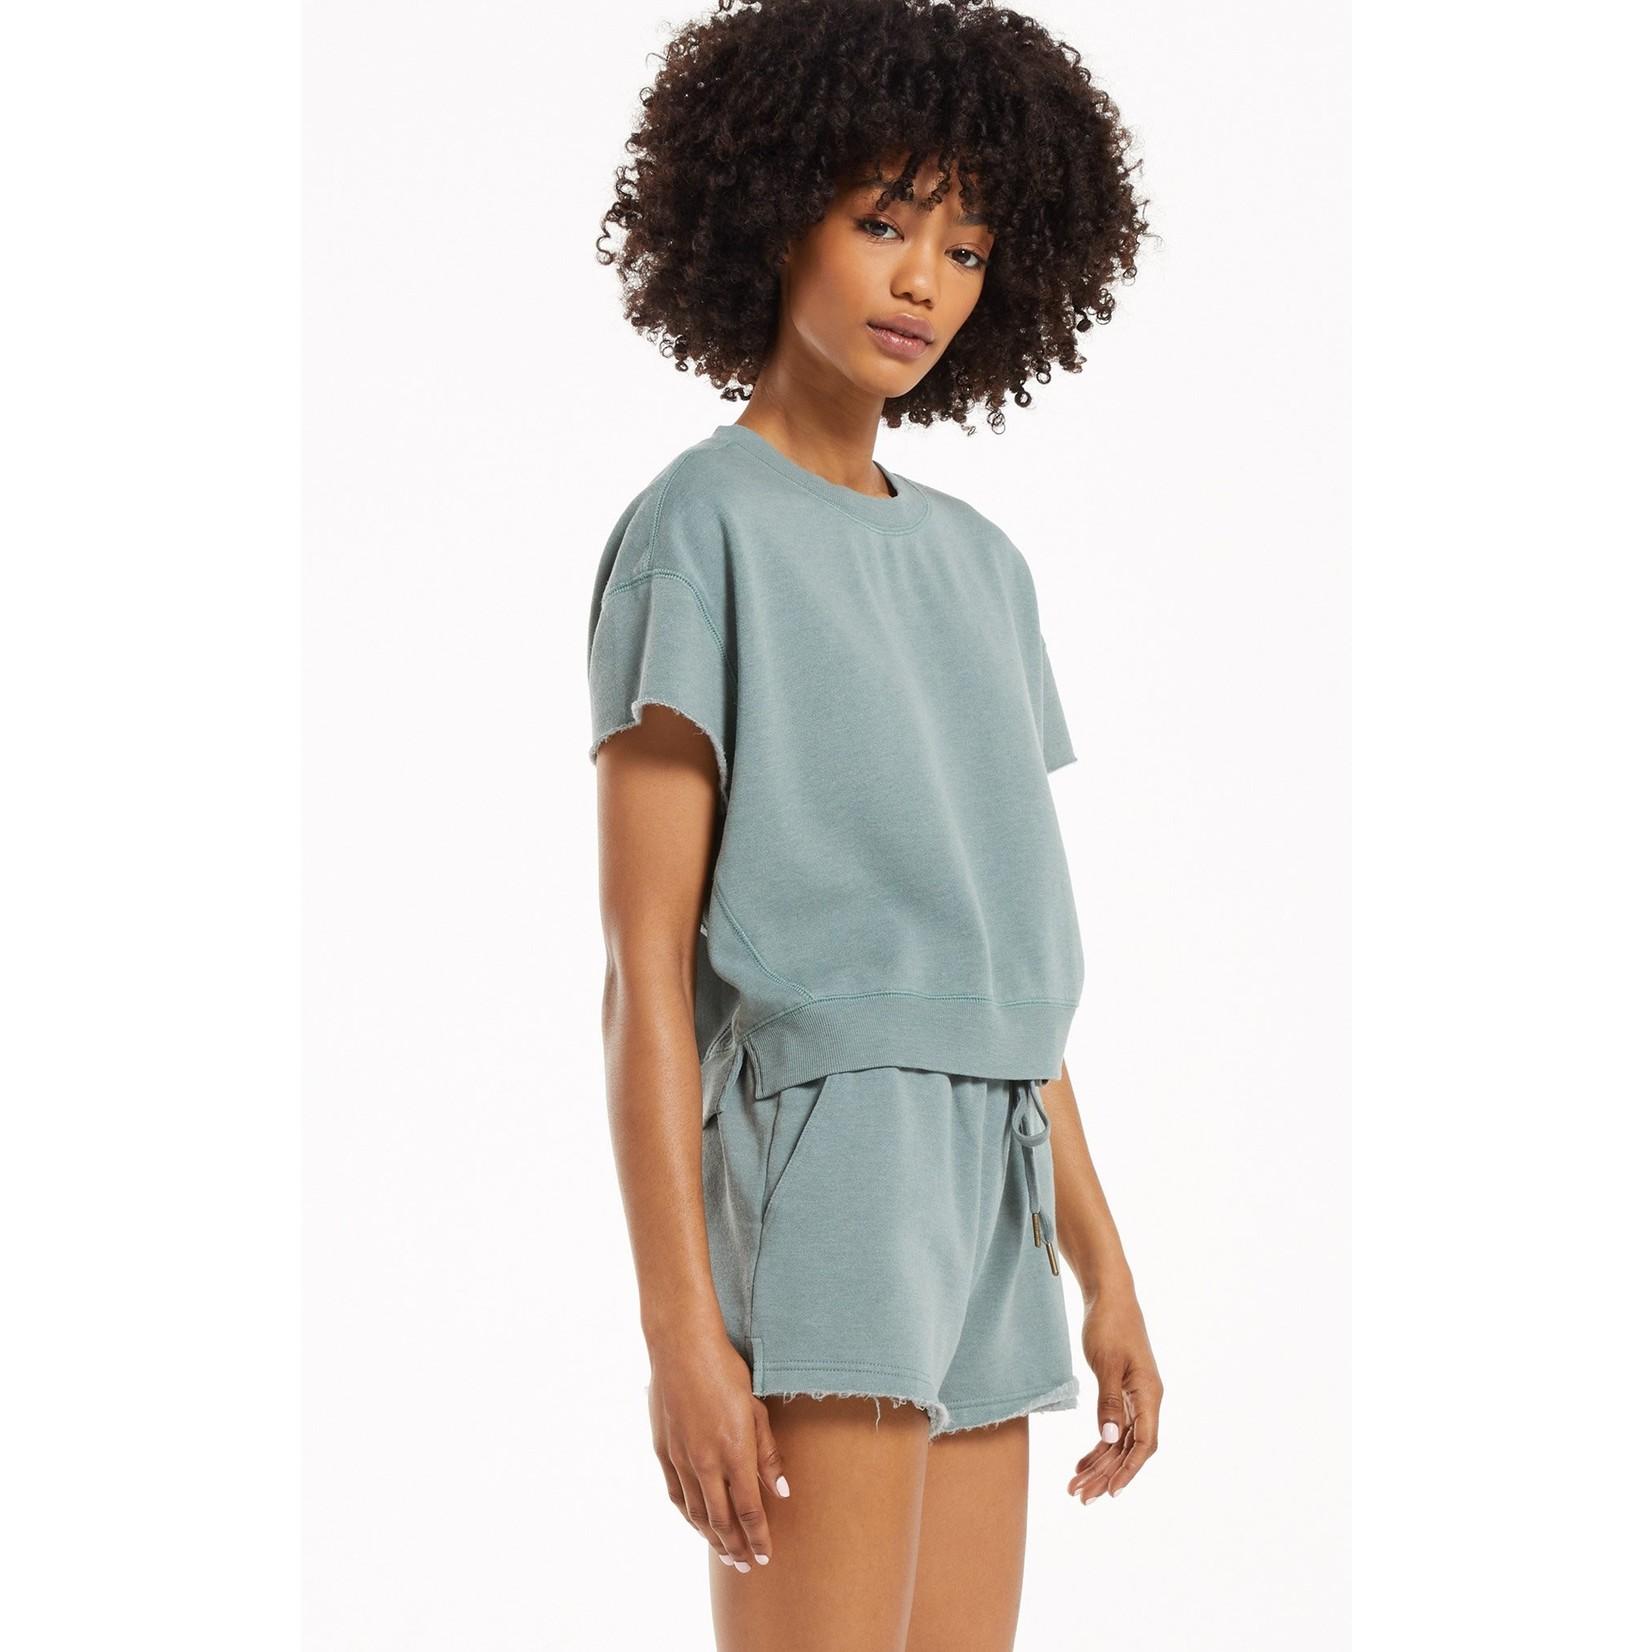 Z Supply Adah Fleece Short Sleeve Top